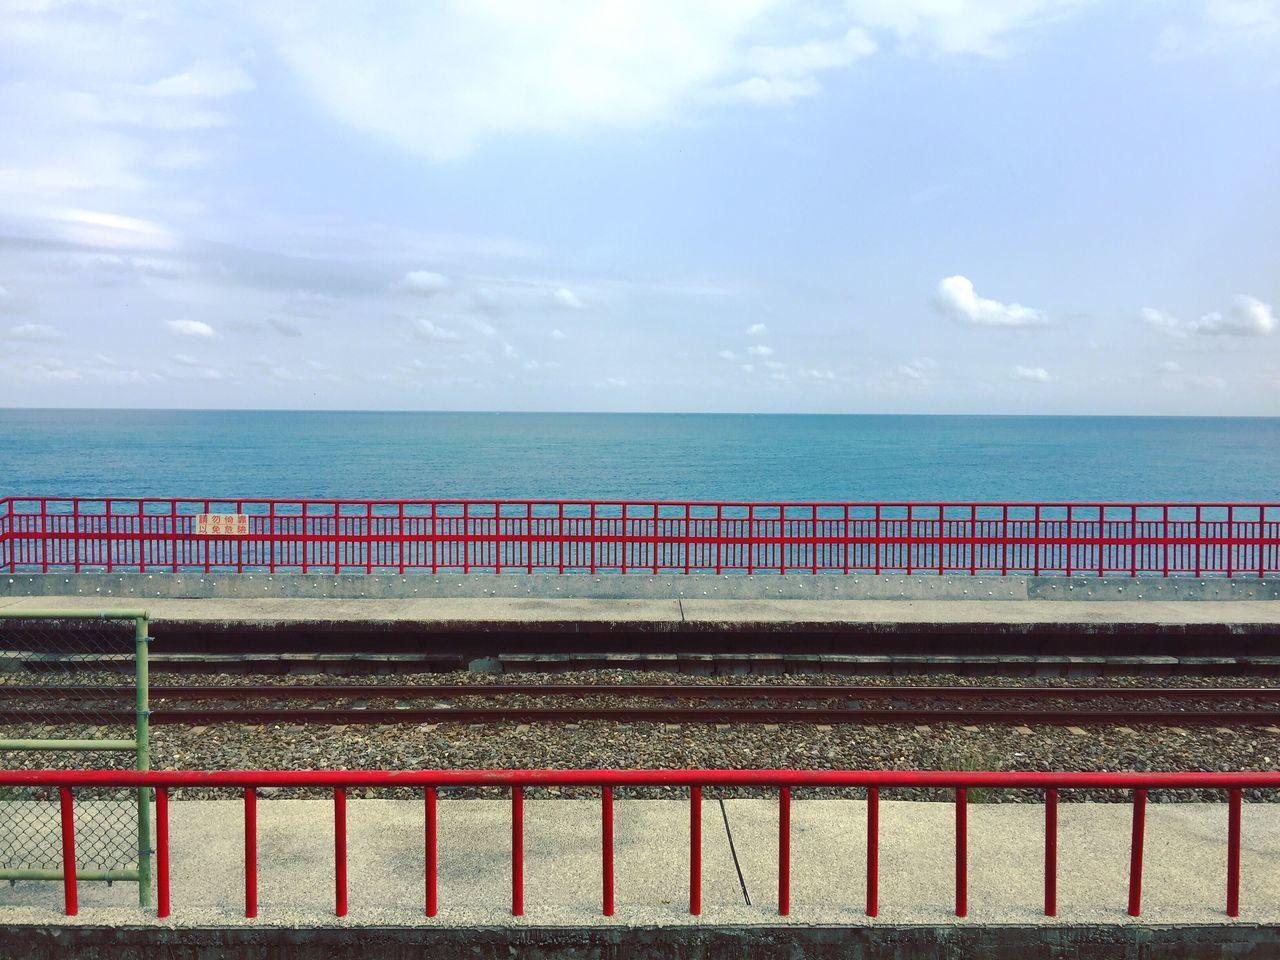 EyeEmNewHere Sea No People Beauty In Nature Travel Photography Miles Away Enjoying Life Station EyeEm Taiwan Transportation